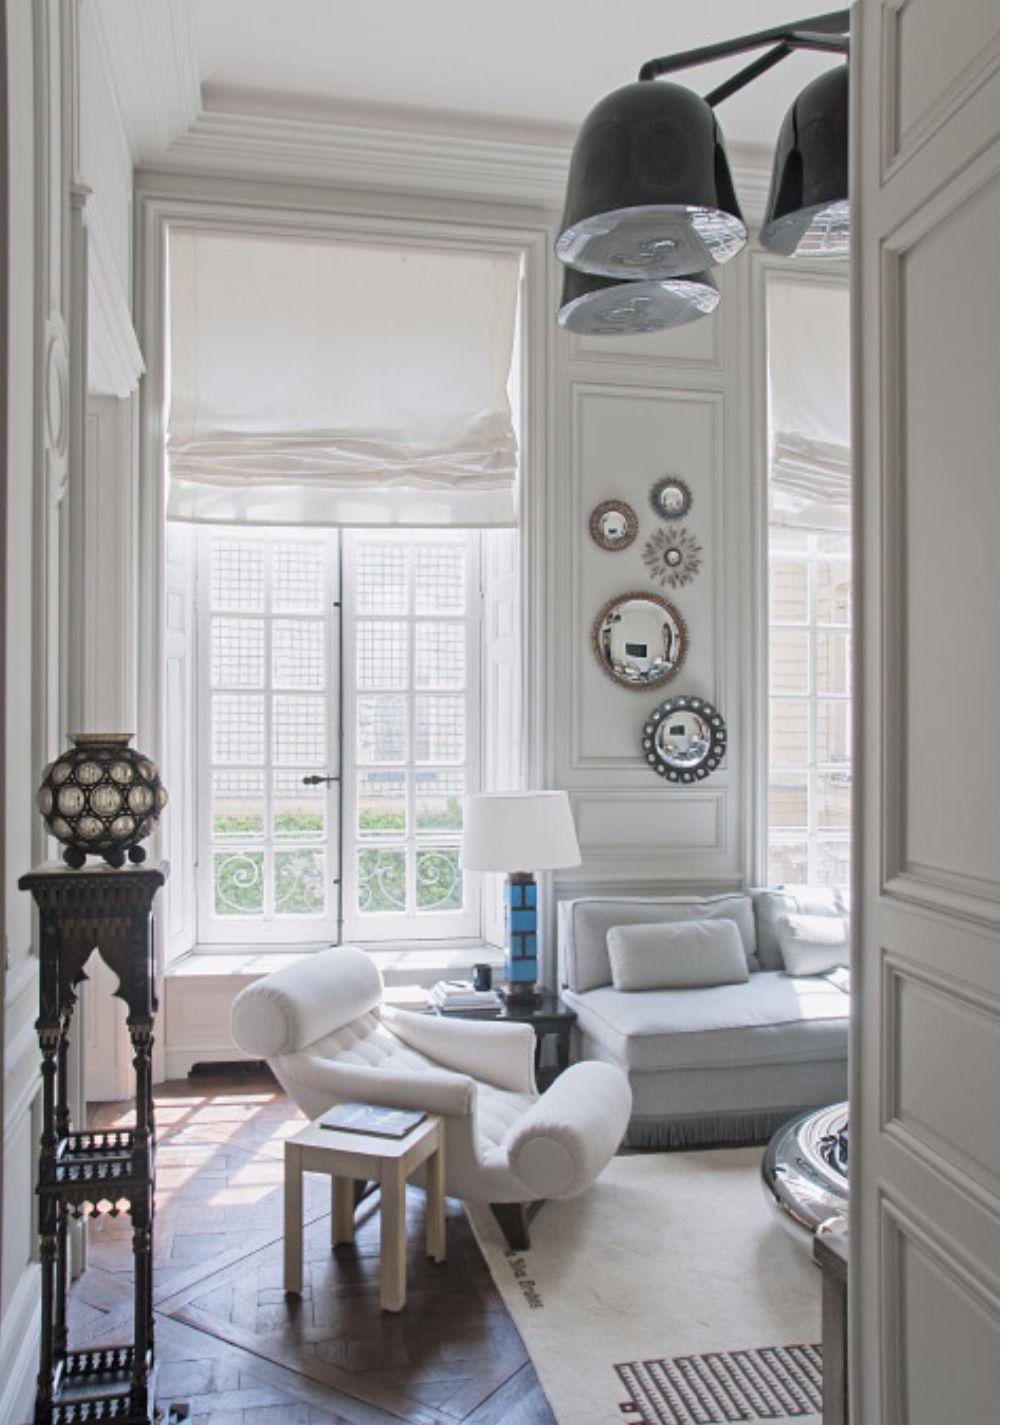 Designer Living Rooms Captivating Pinjennifer Gray On Adroit Design 89  Pinterest  Living Review